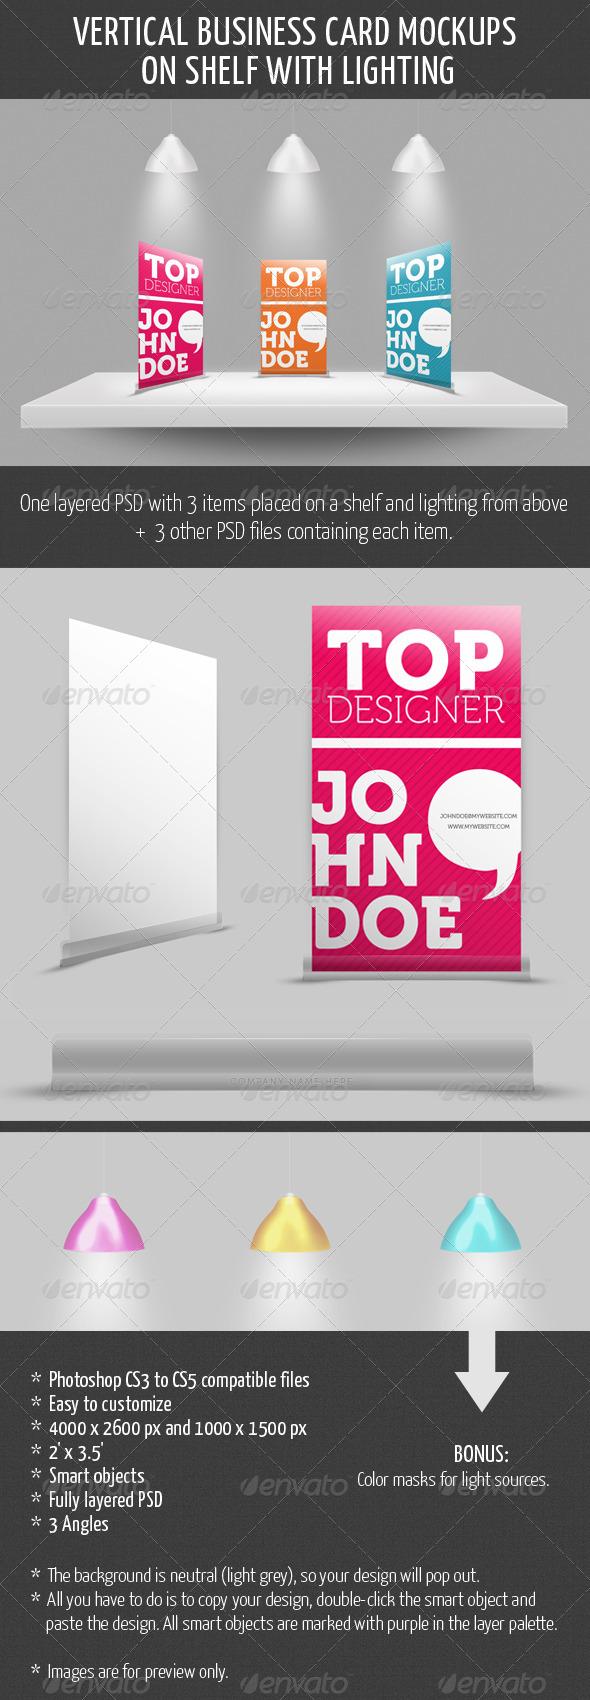 Vertical Business Card Mockup on Shelf - Business Cards Print